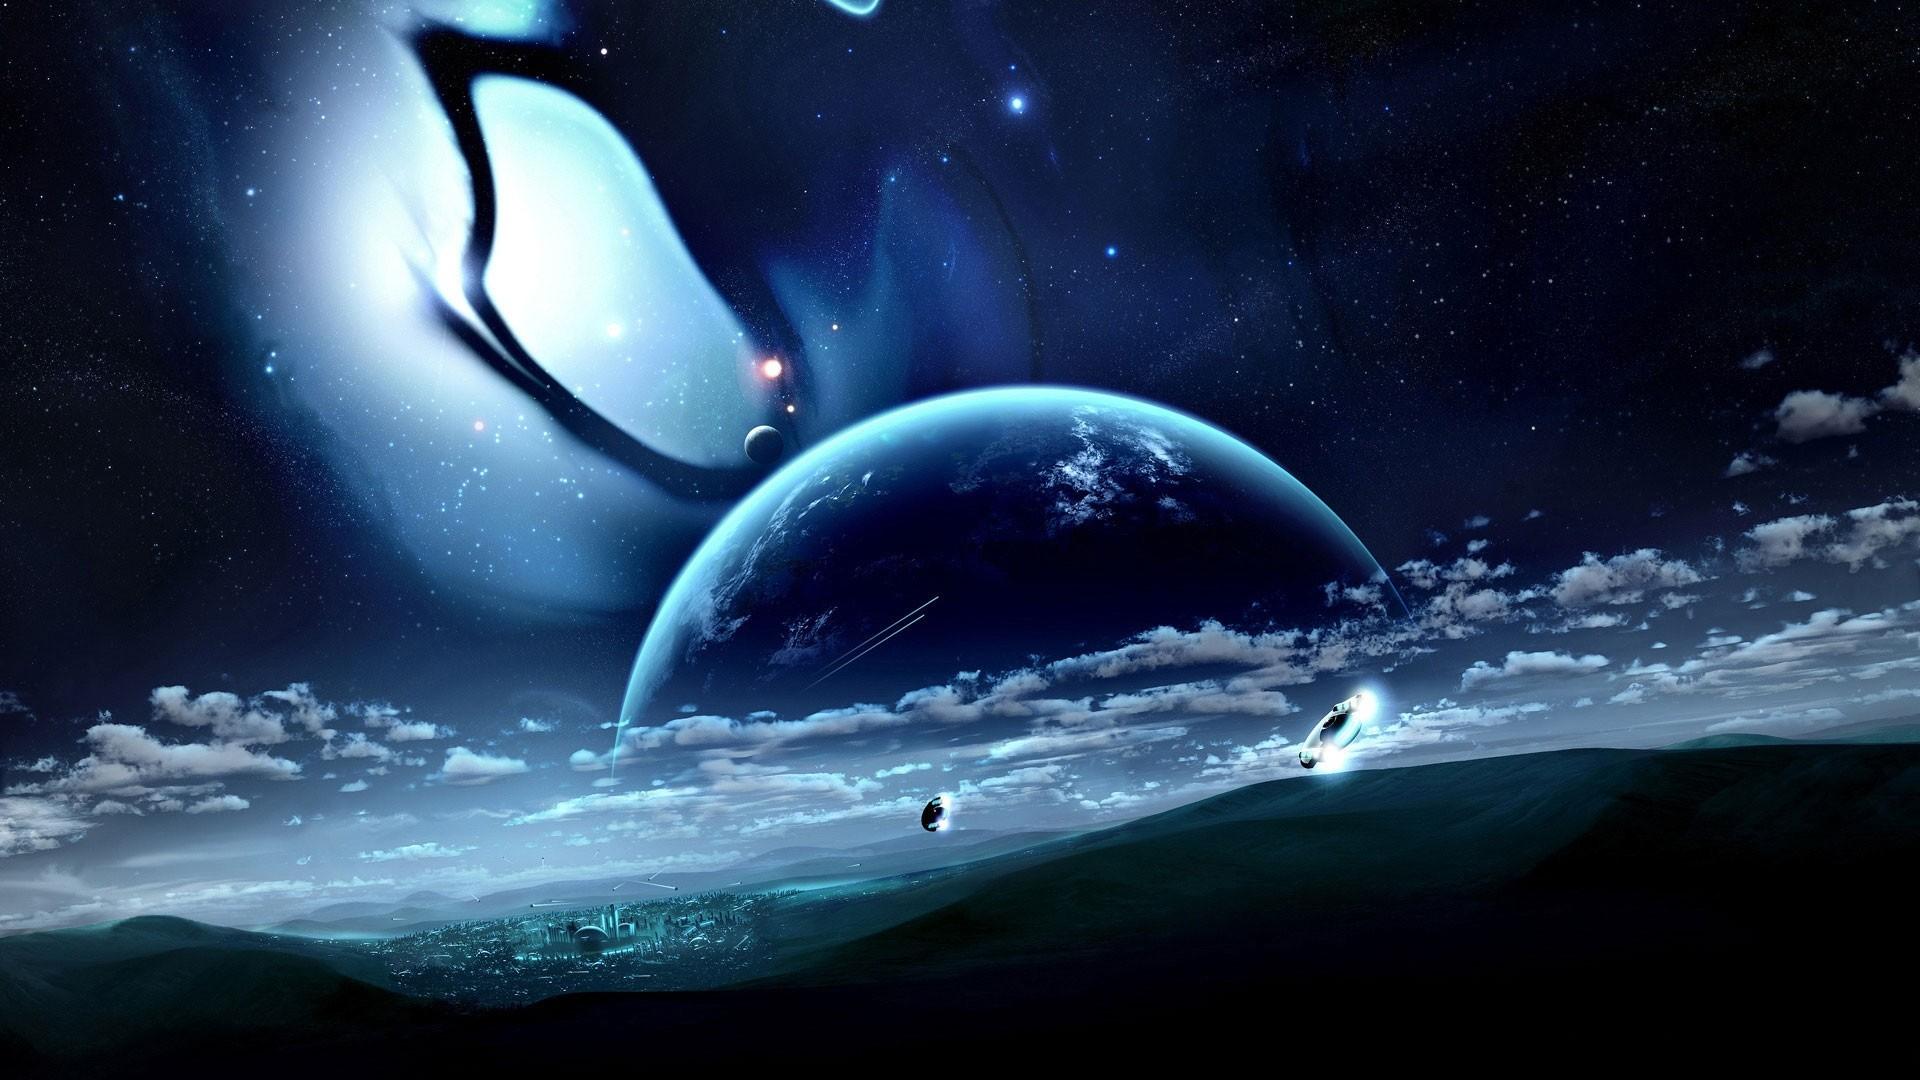 Space Fantasy HD Desktop Wallpapers 4